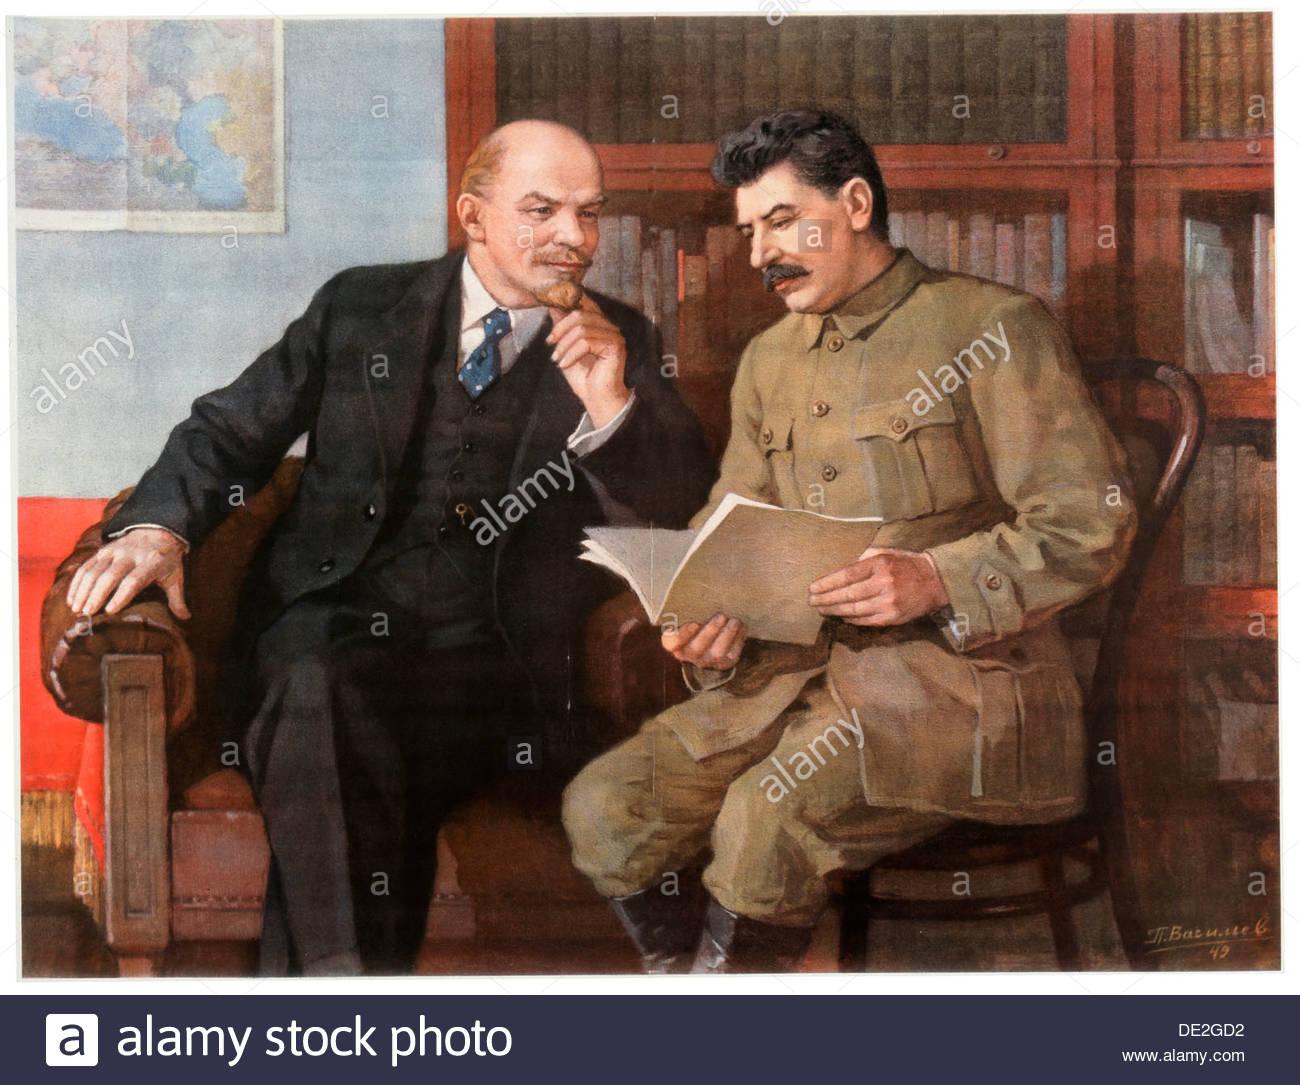 'Lenin and Stalin', poster, c1949-c1950. Artist: Pyotr Vasilyev - Stock Image